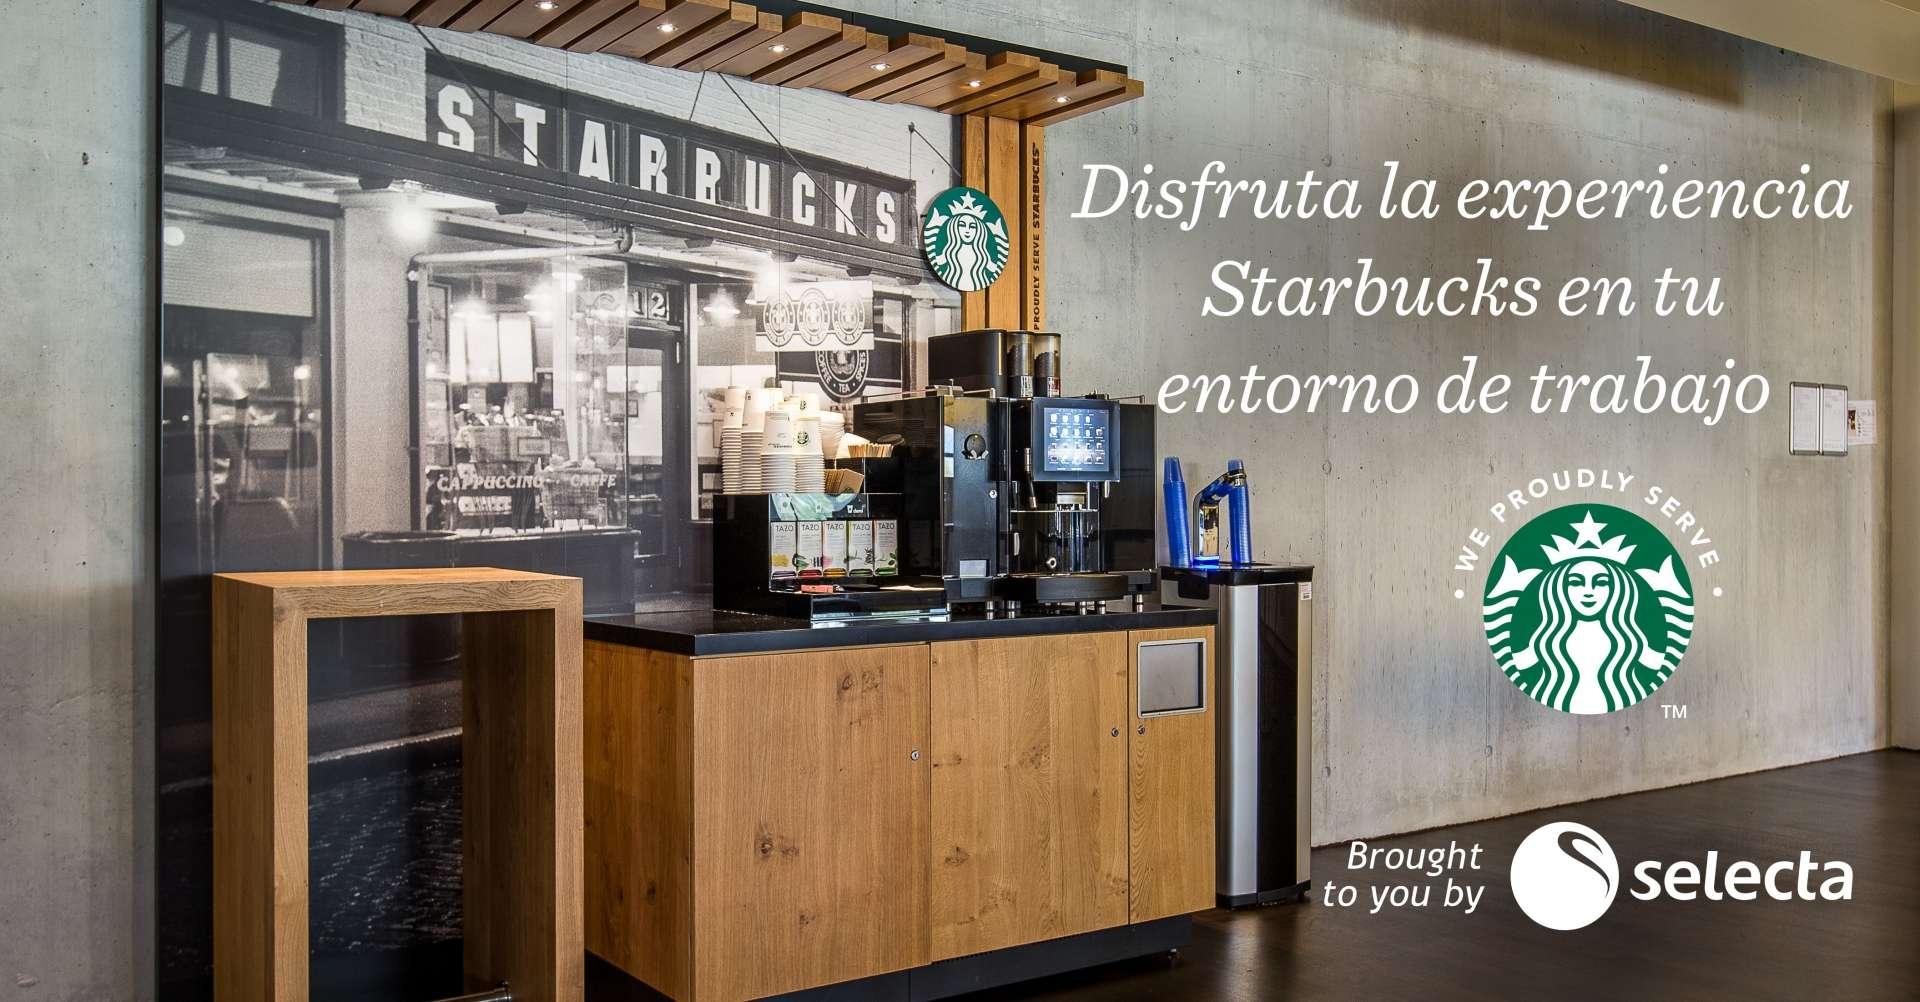 We Proudly Serve Starbucks